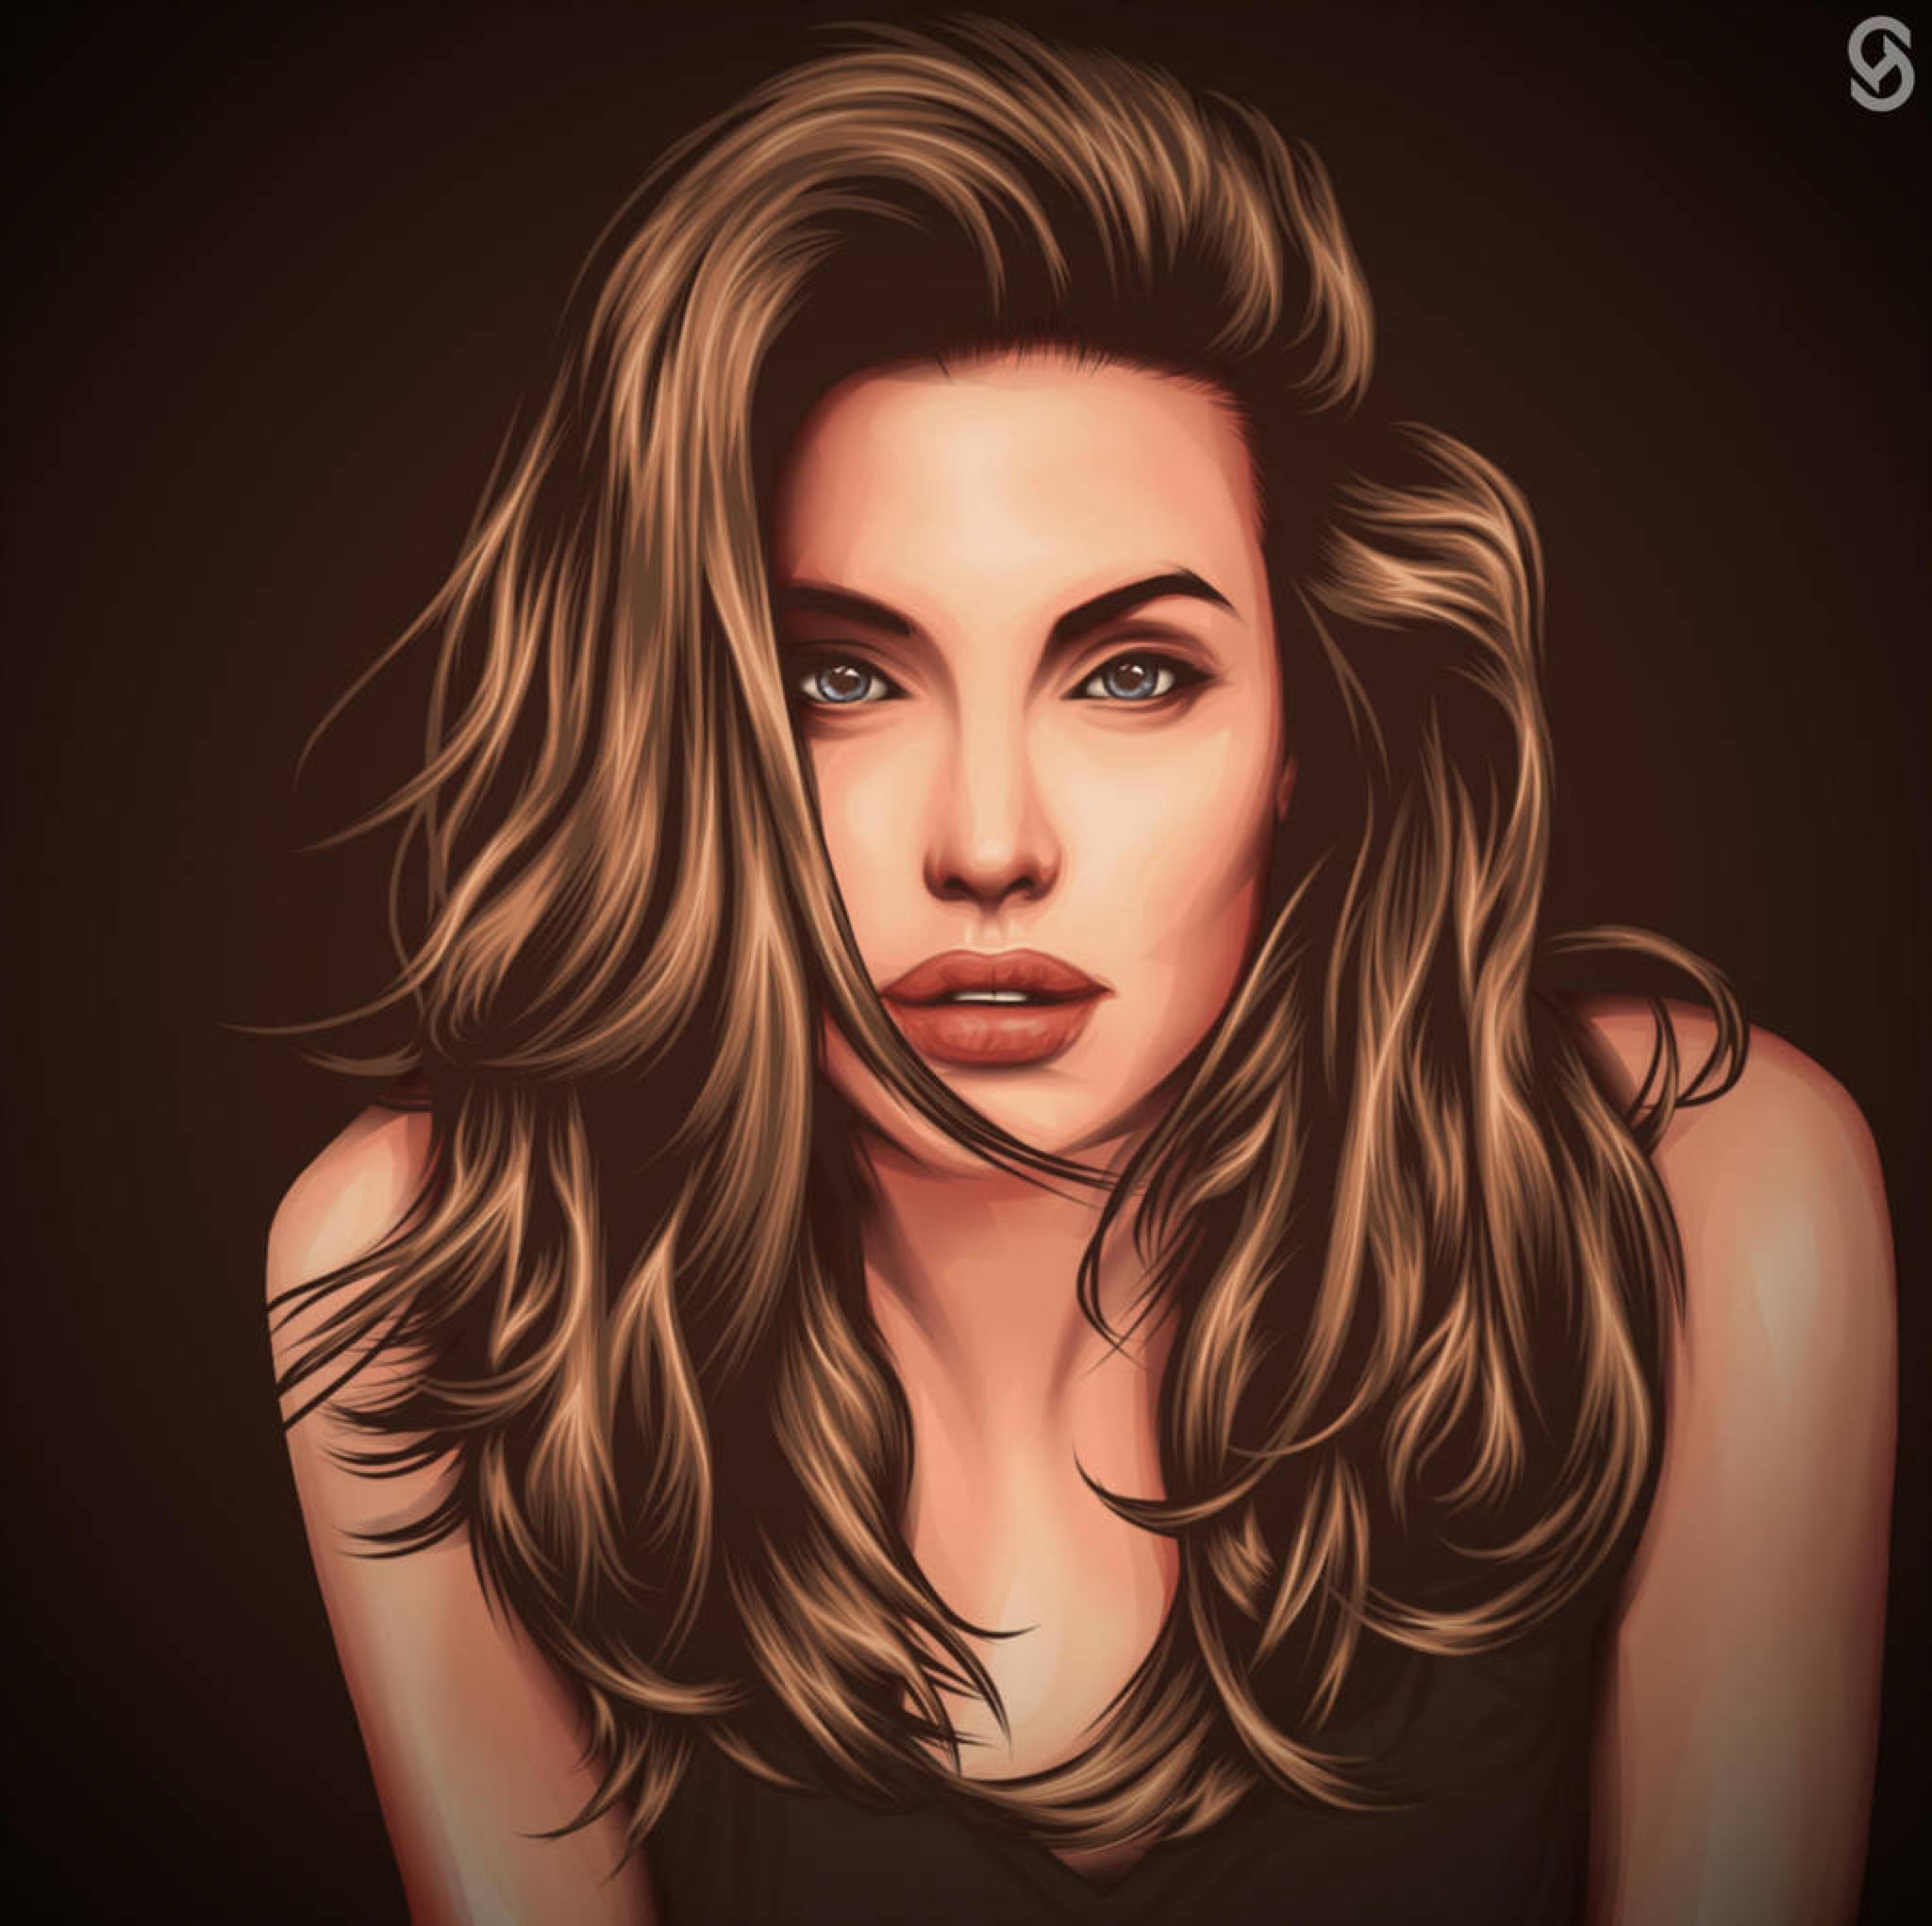 Digital Painting, Digital portrait, Cartoon Illustration, Cartoon Logo, Cartoon Portrait, Gift idea